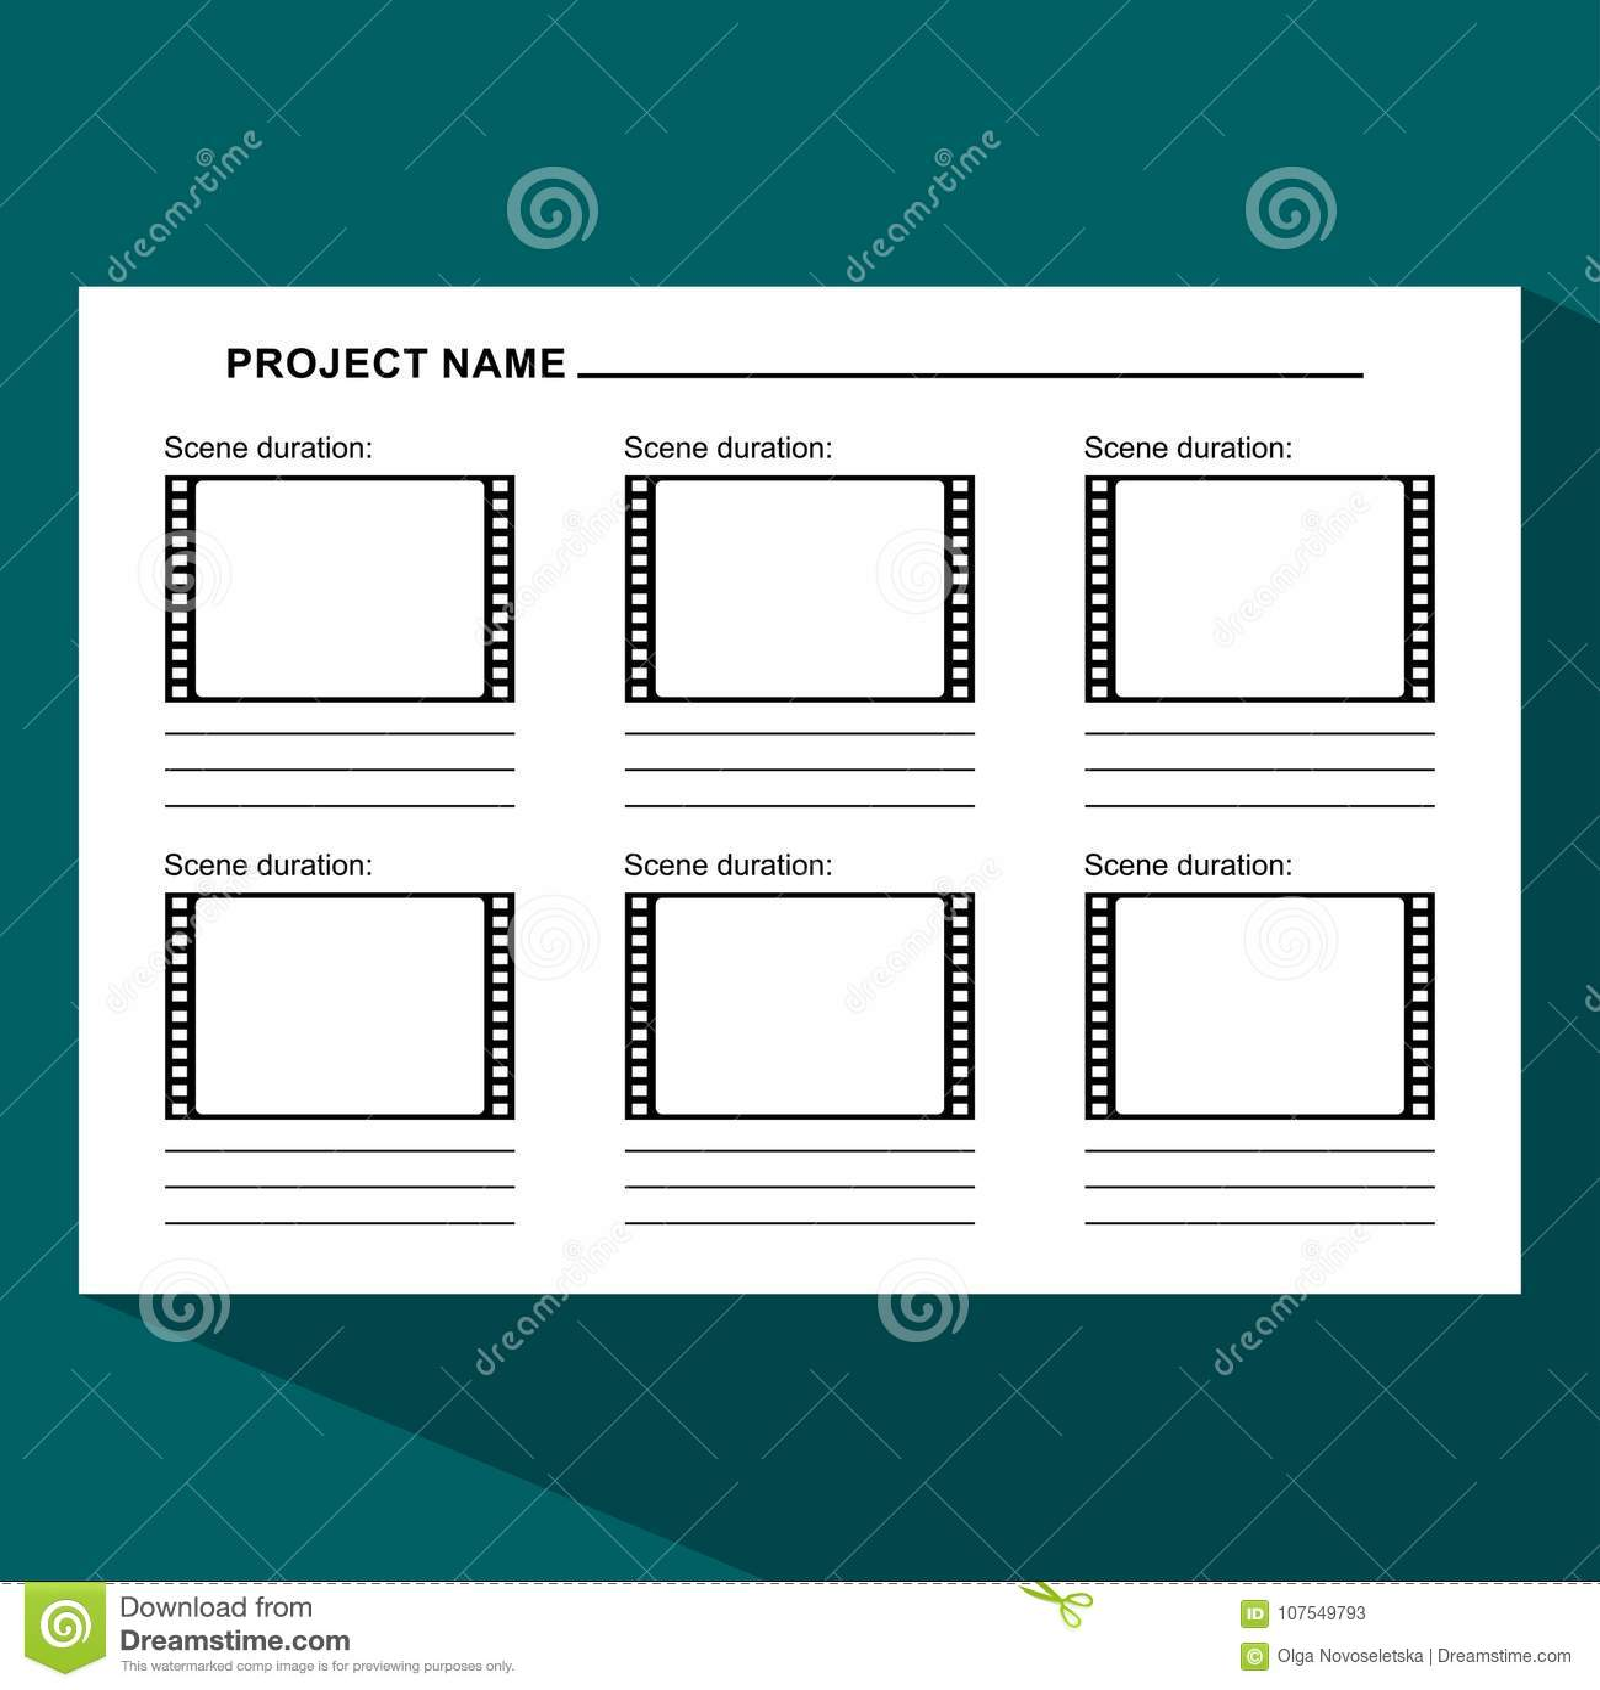 Storyboard template dark stock vector. Illustration of director ...